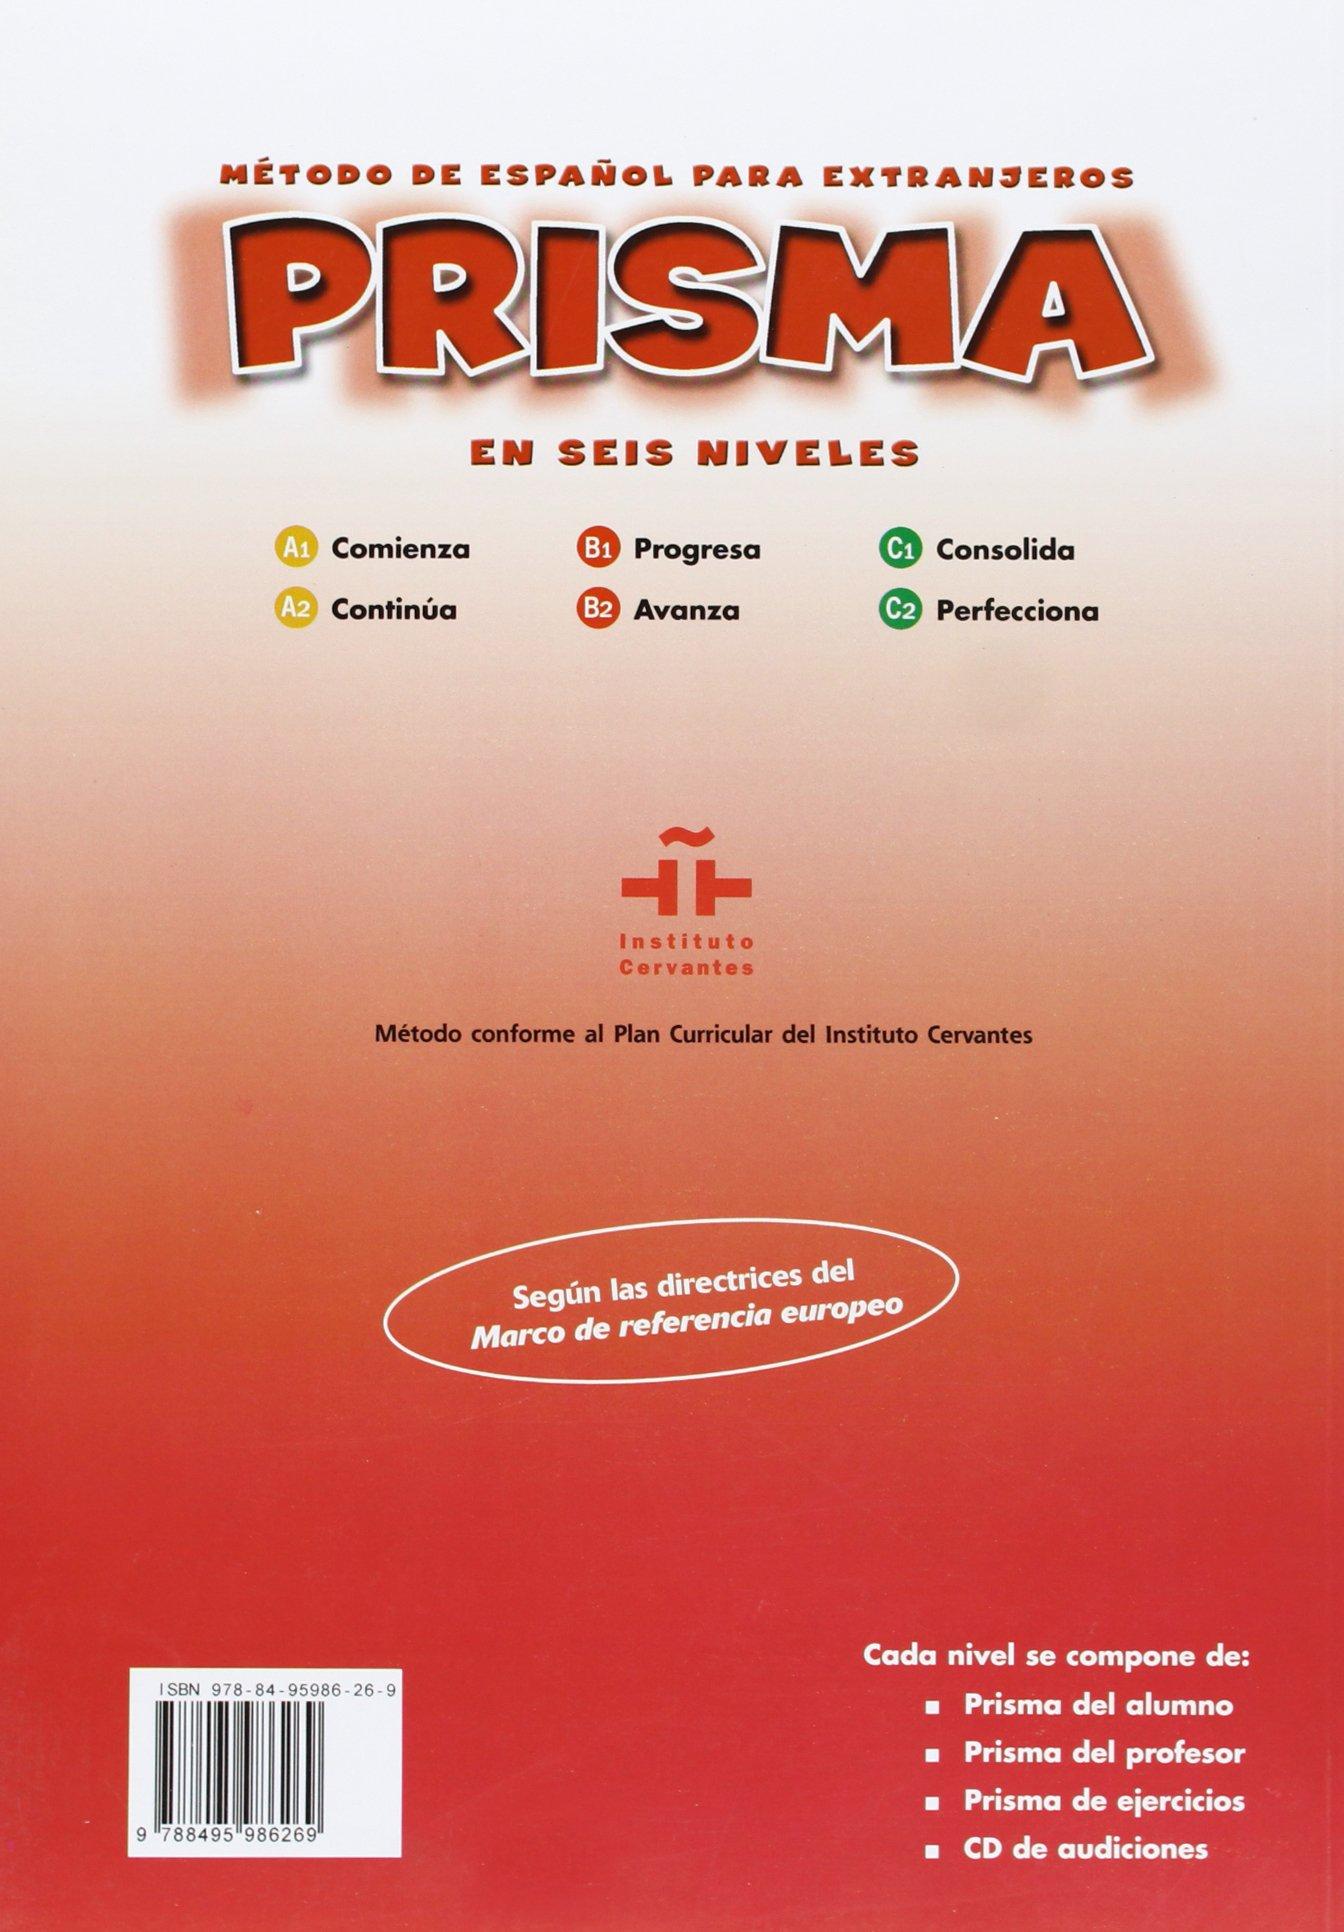 Prisma c1 consolida prisma c1 growth metodo de espanol para prisma c1 consolida prisma c1 growth metodo de espanol para extranjeros spanish edition equipo prisma 9788495986269 amazon books fandeluxe Images